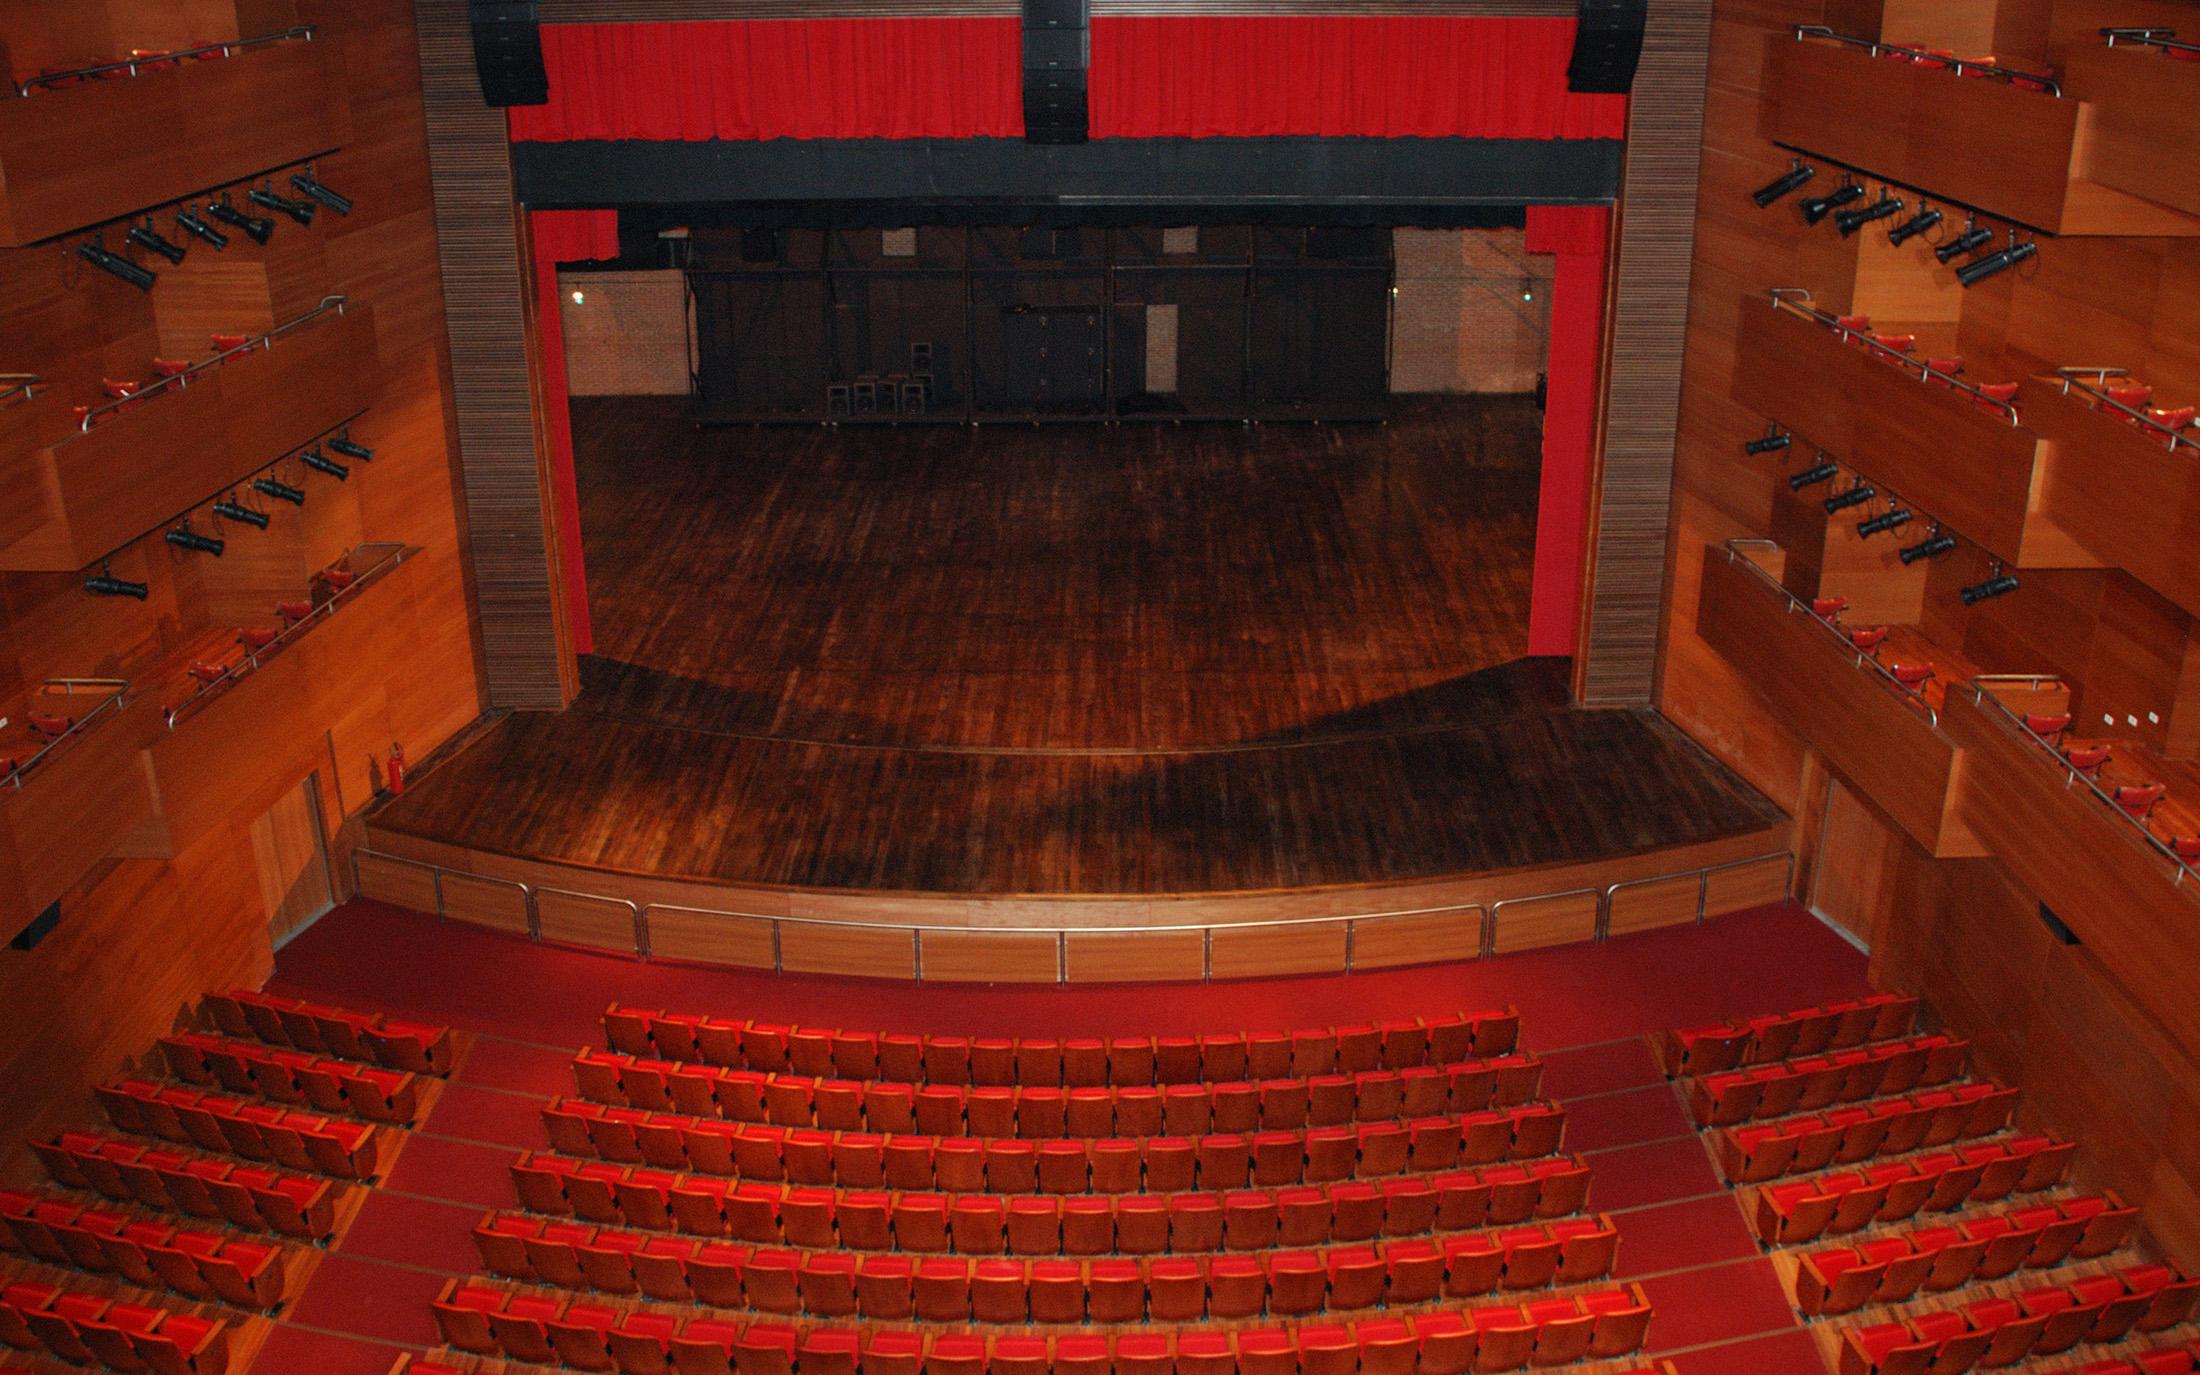 Theatro Municipal de Paulínia Slide 07